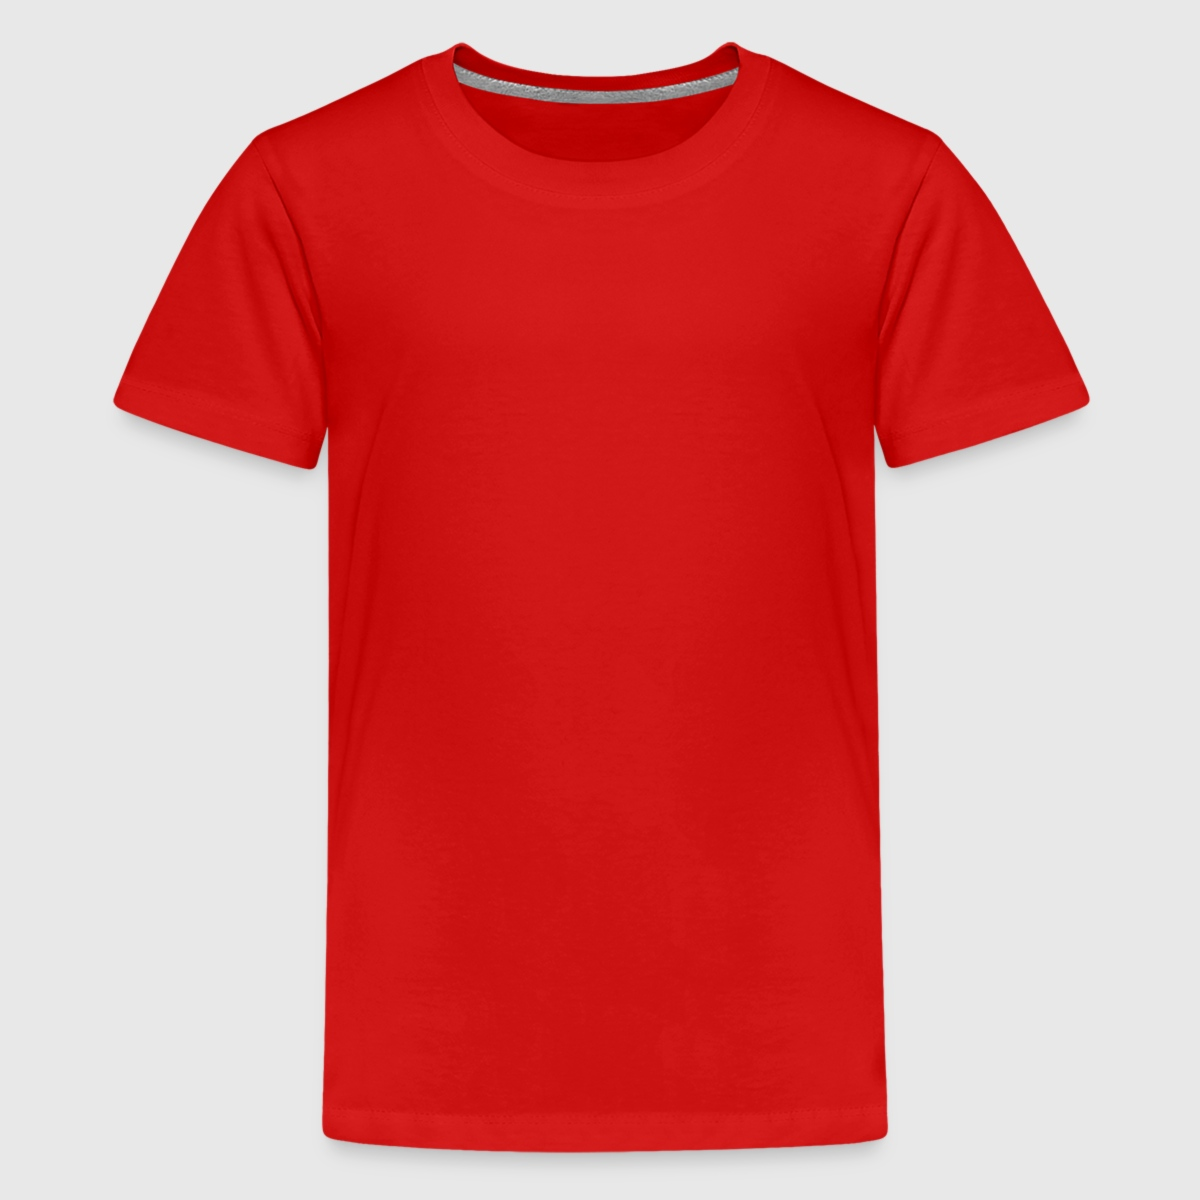 Personalized Kids Premium T Shirt Spreadshirt